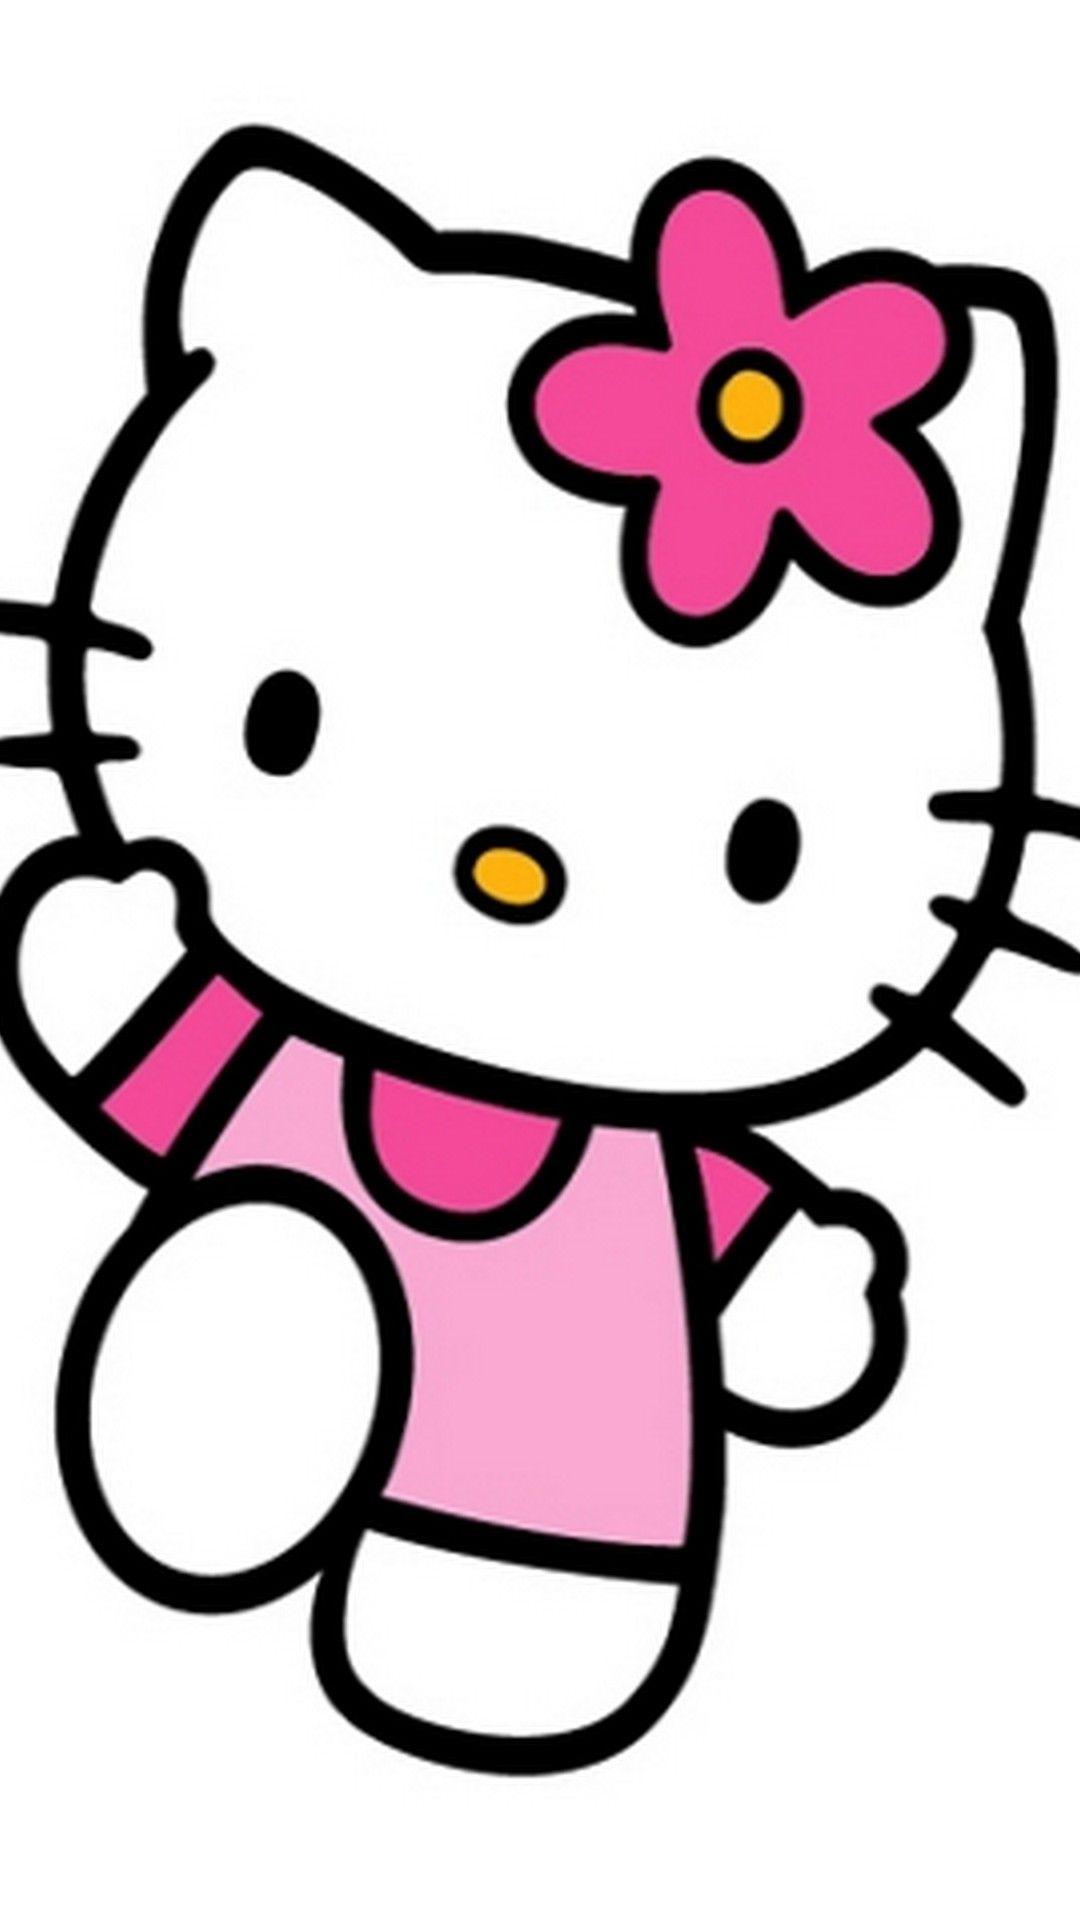 Wallpaper Hello Kitty Mobile | Kitty, Hello kitty, Mac ...